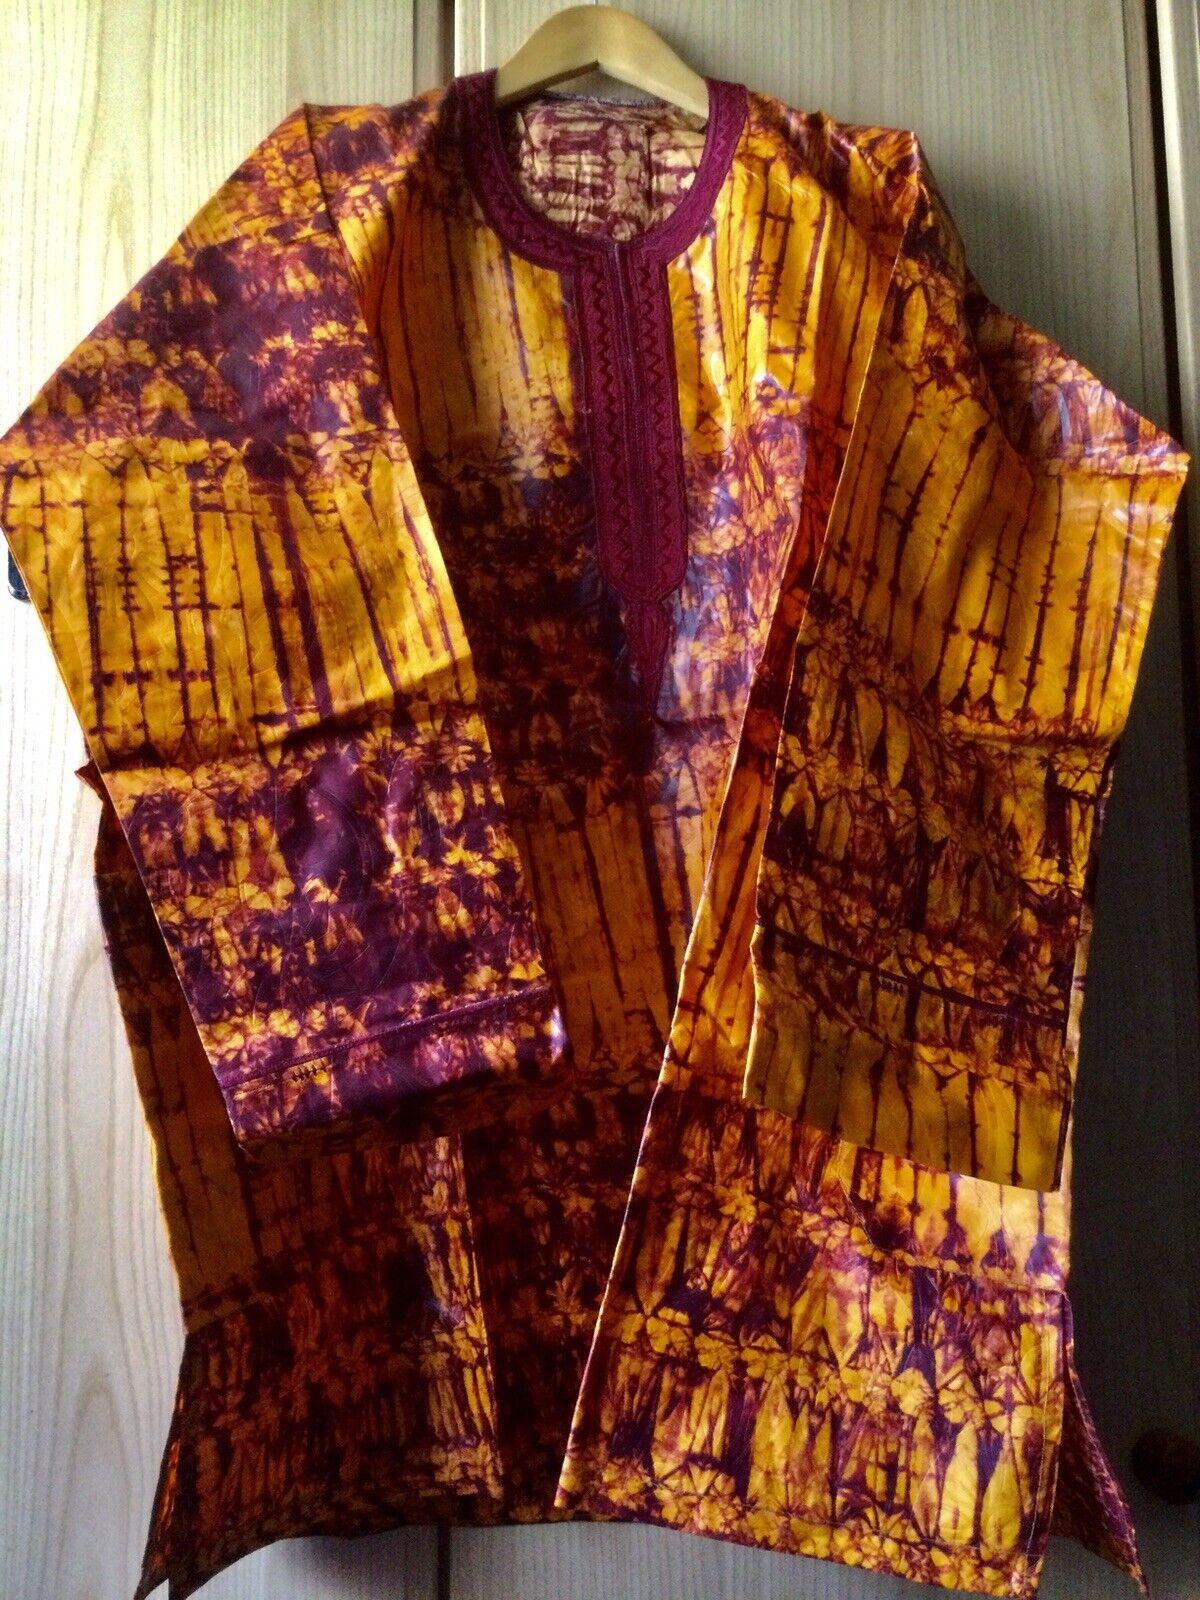 African Tye & Dye Mens Top ~ New! Size XXXL!